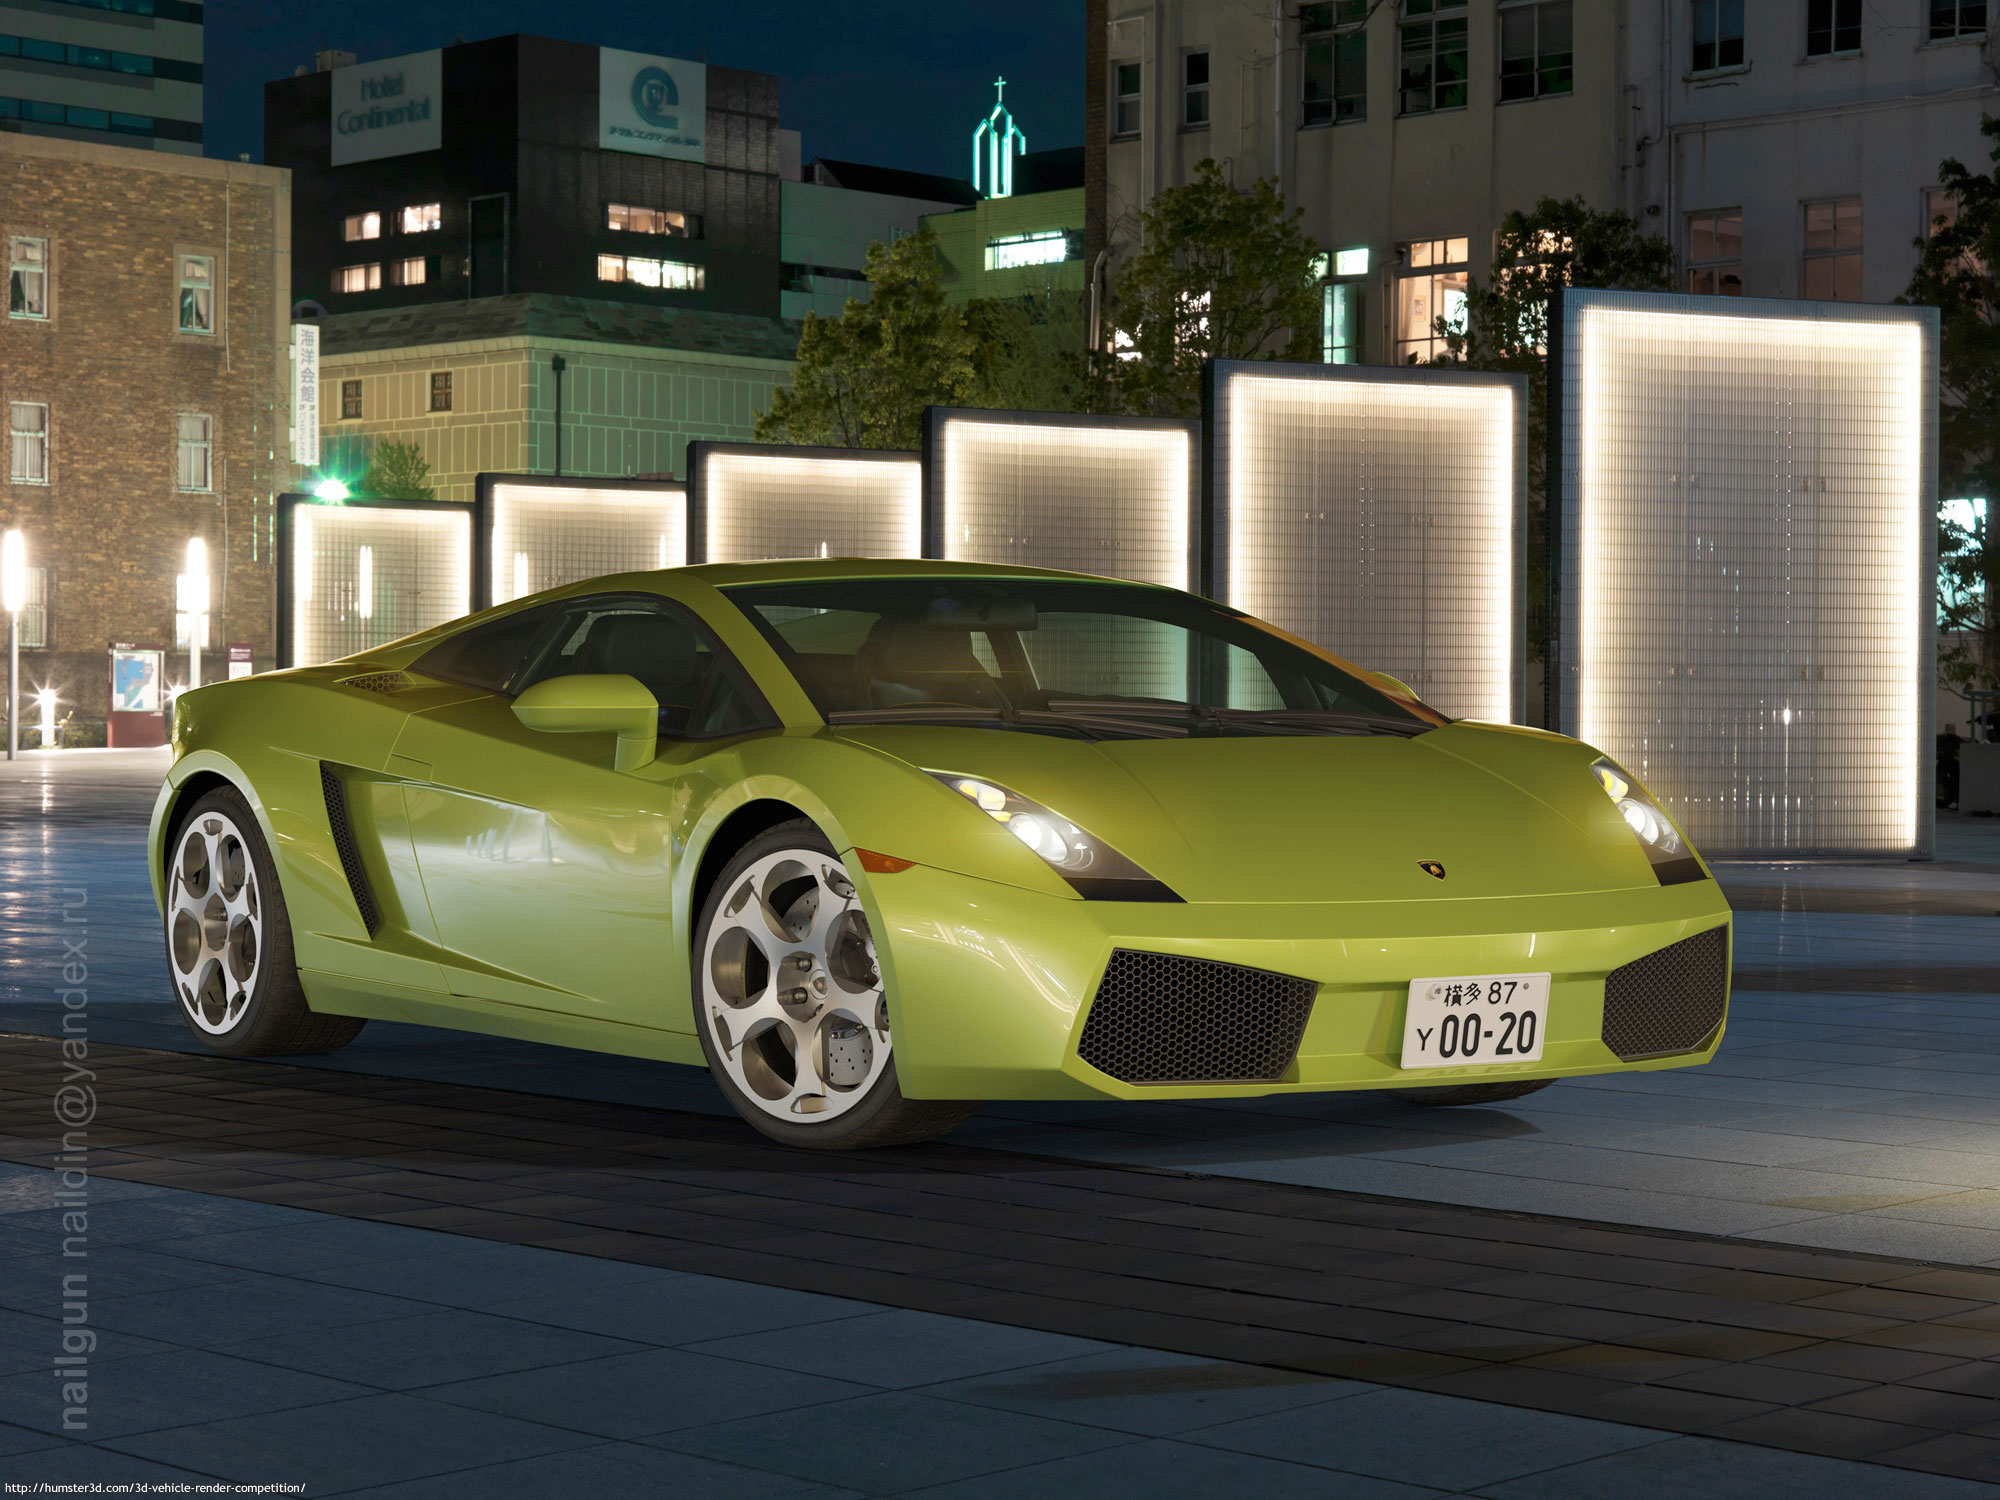 Lamborghini Gallardo, Italy